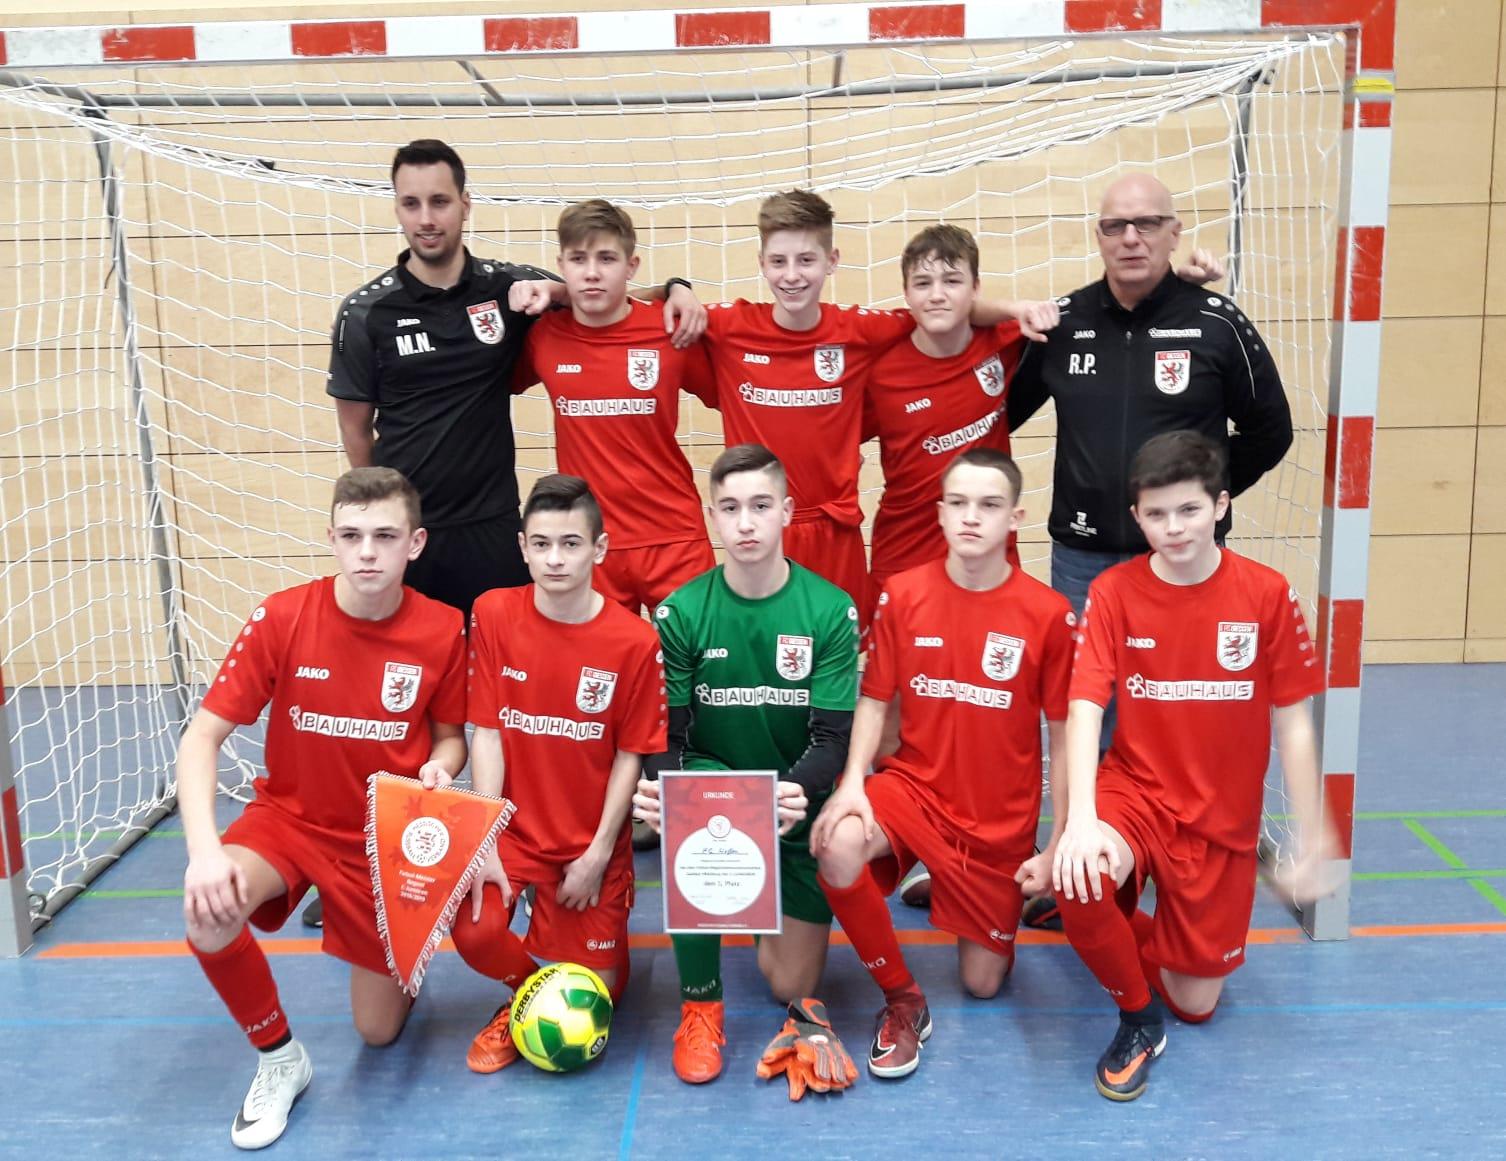 U15 kürt sich zum Futsal-Regionalmeister